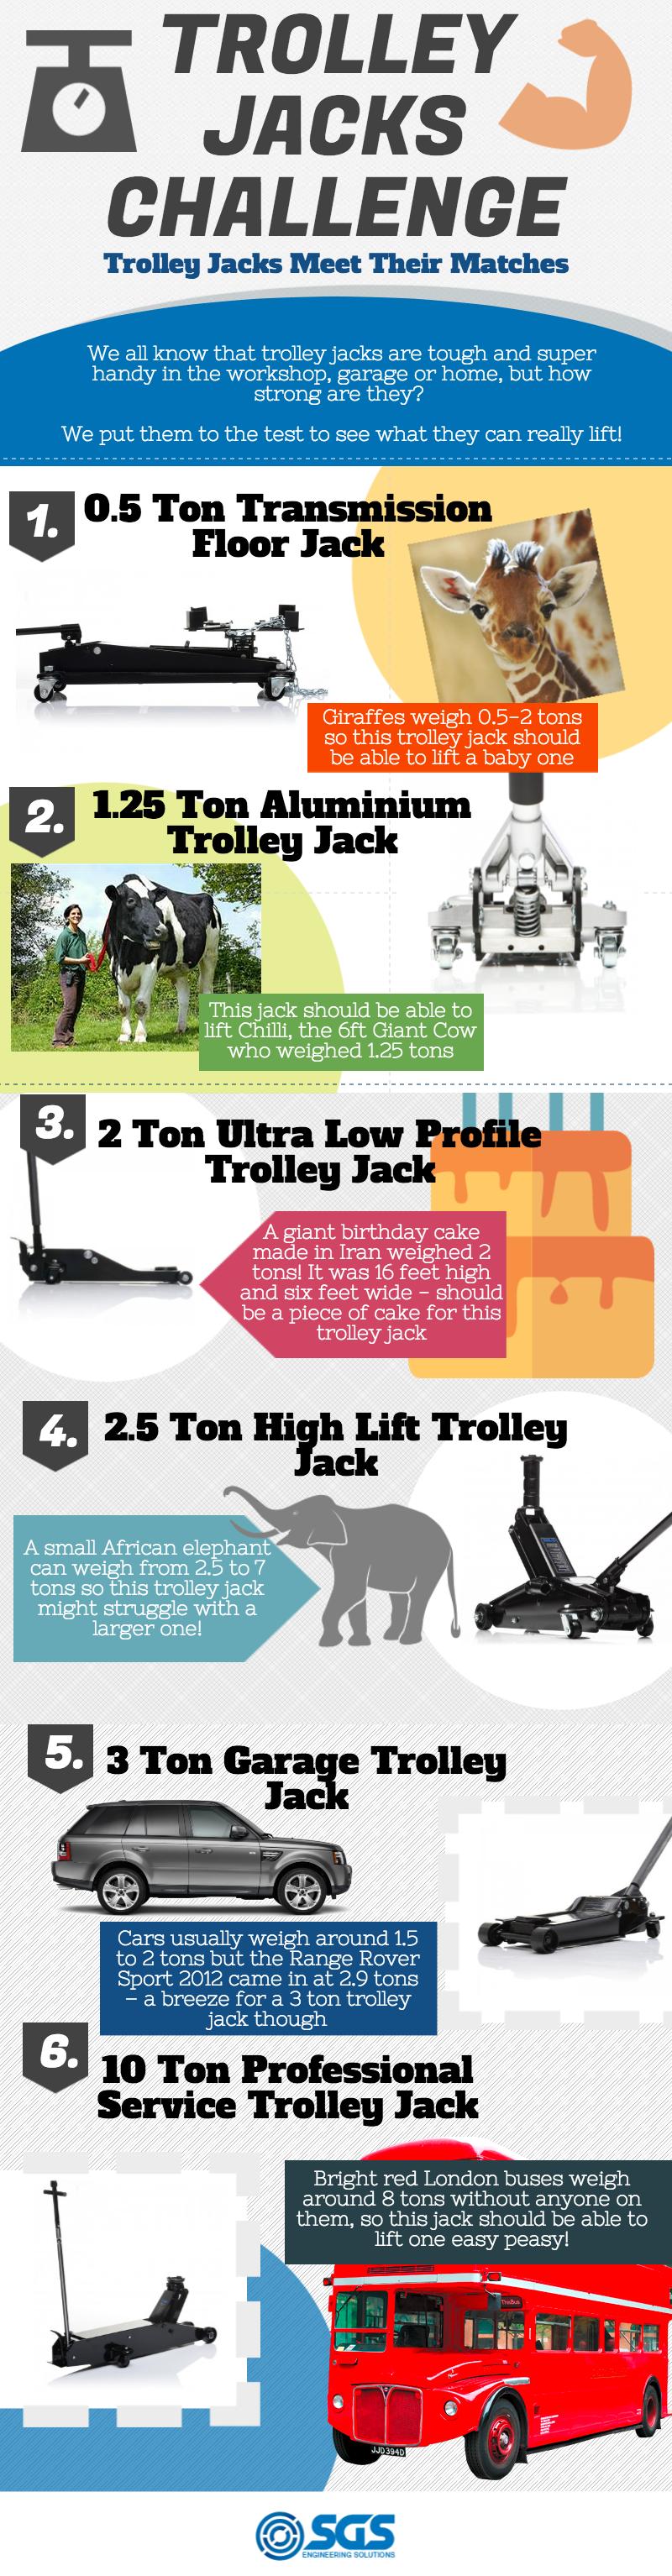 Trolley Jacks Meet Their Matches